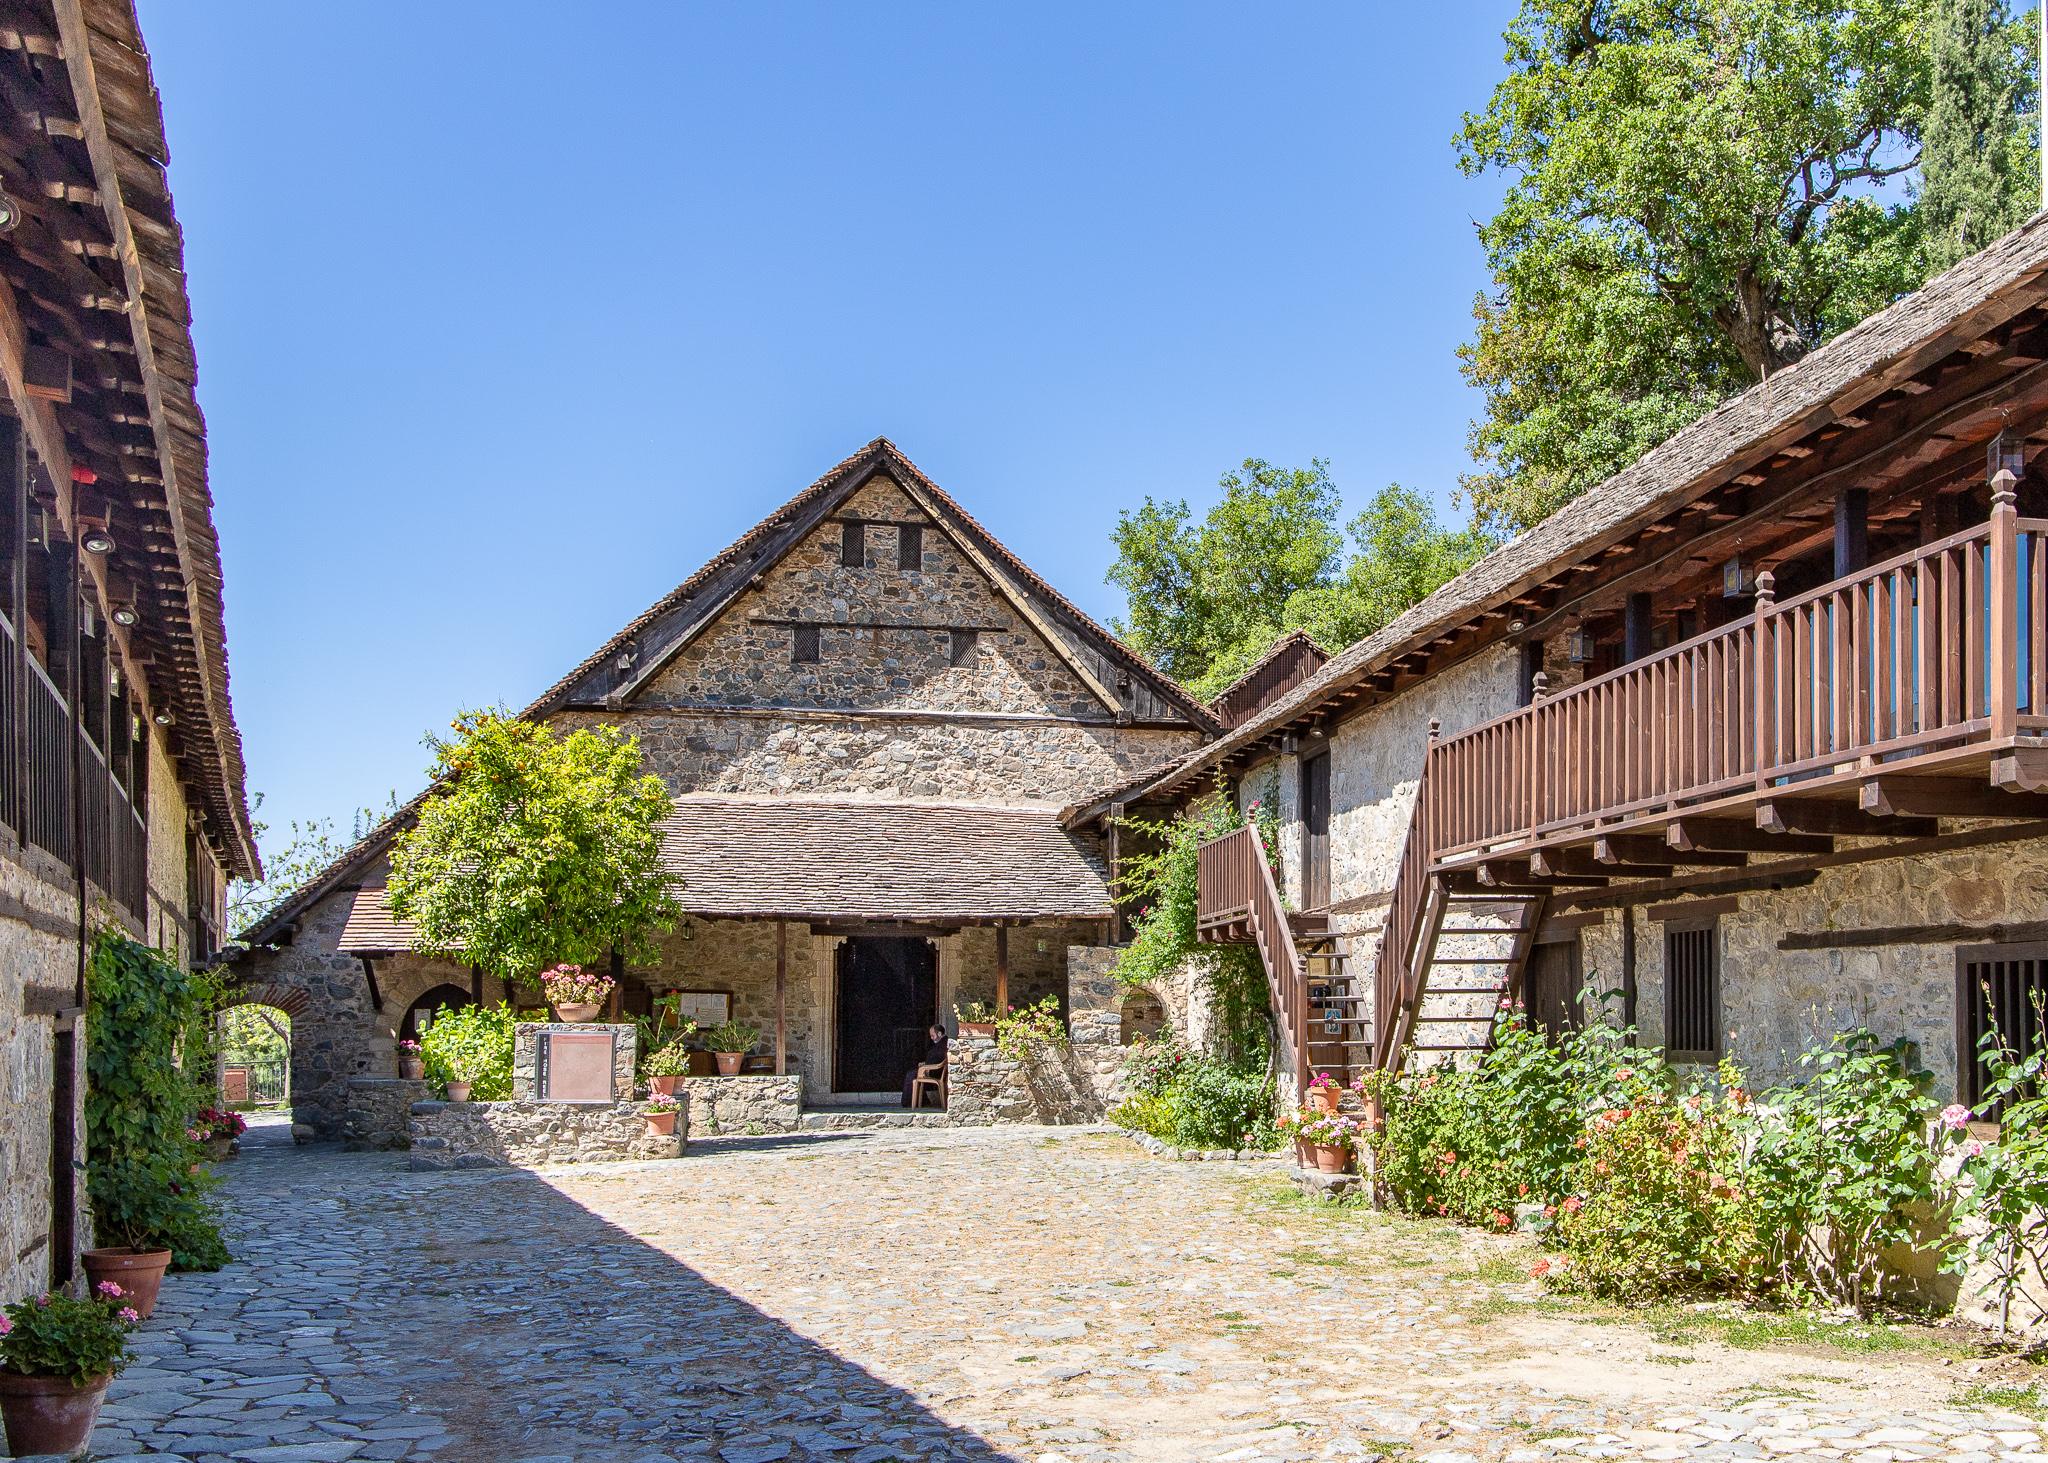 The Monastery Courtyard